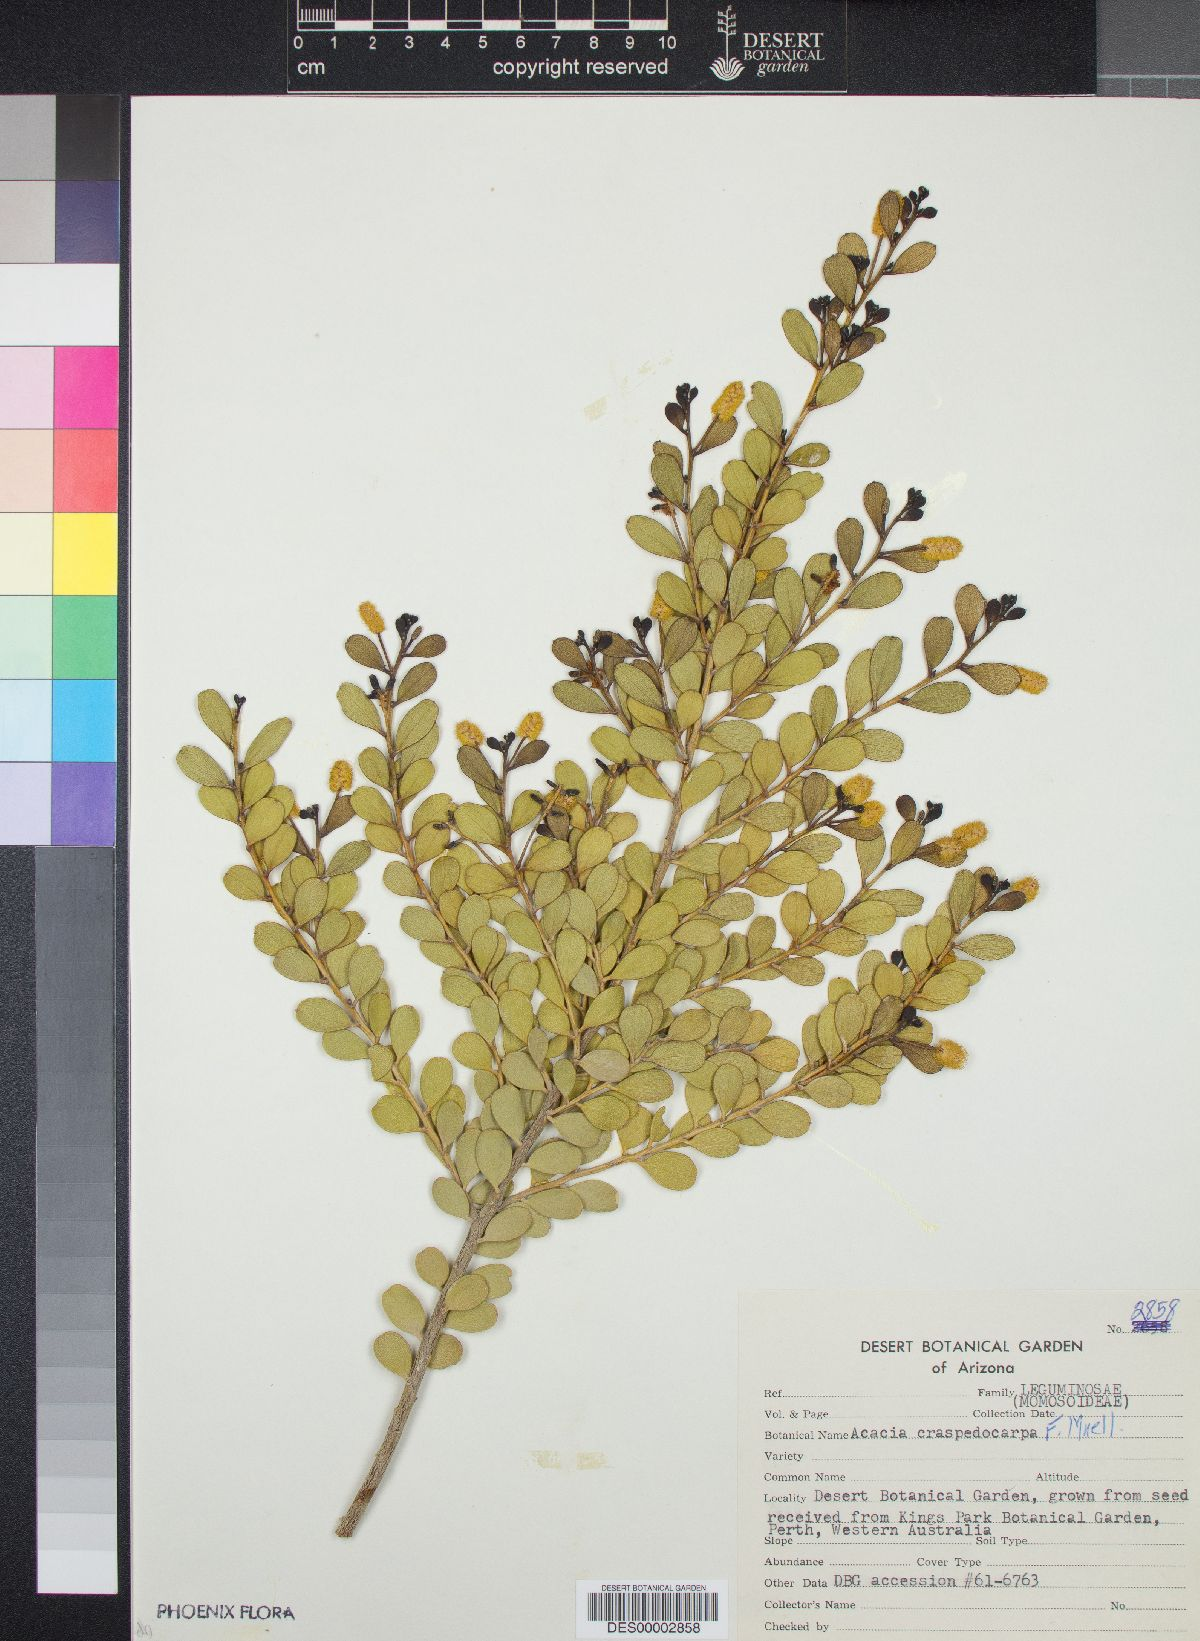 Acacia craspedocarpa image